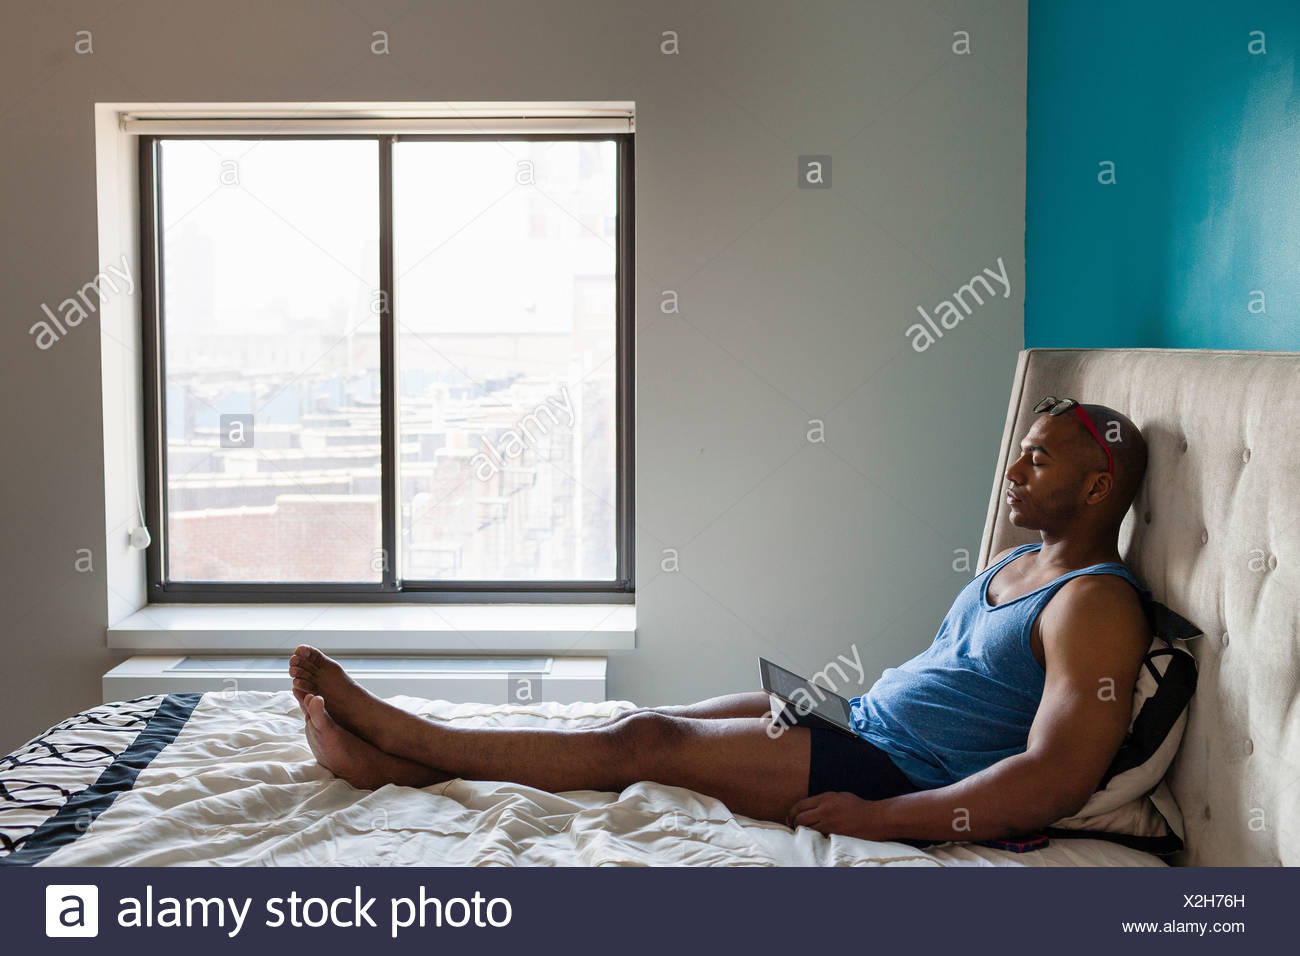 Mid adult man sleeping in bedroom - Stock Image